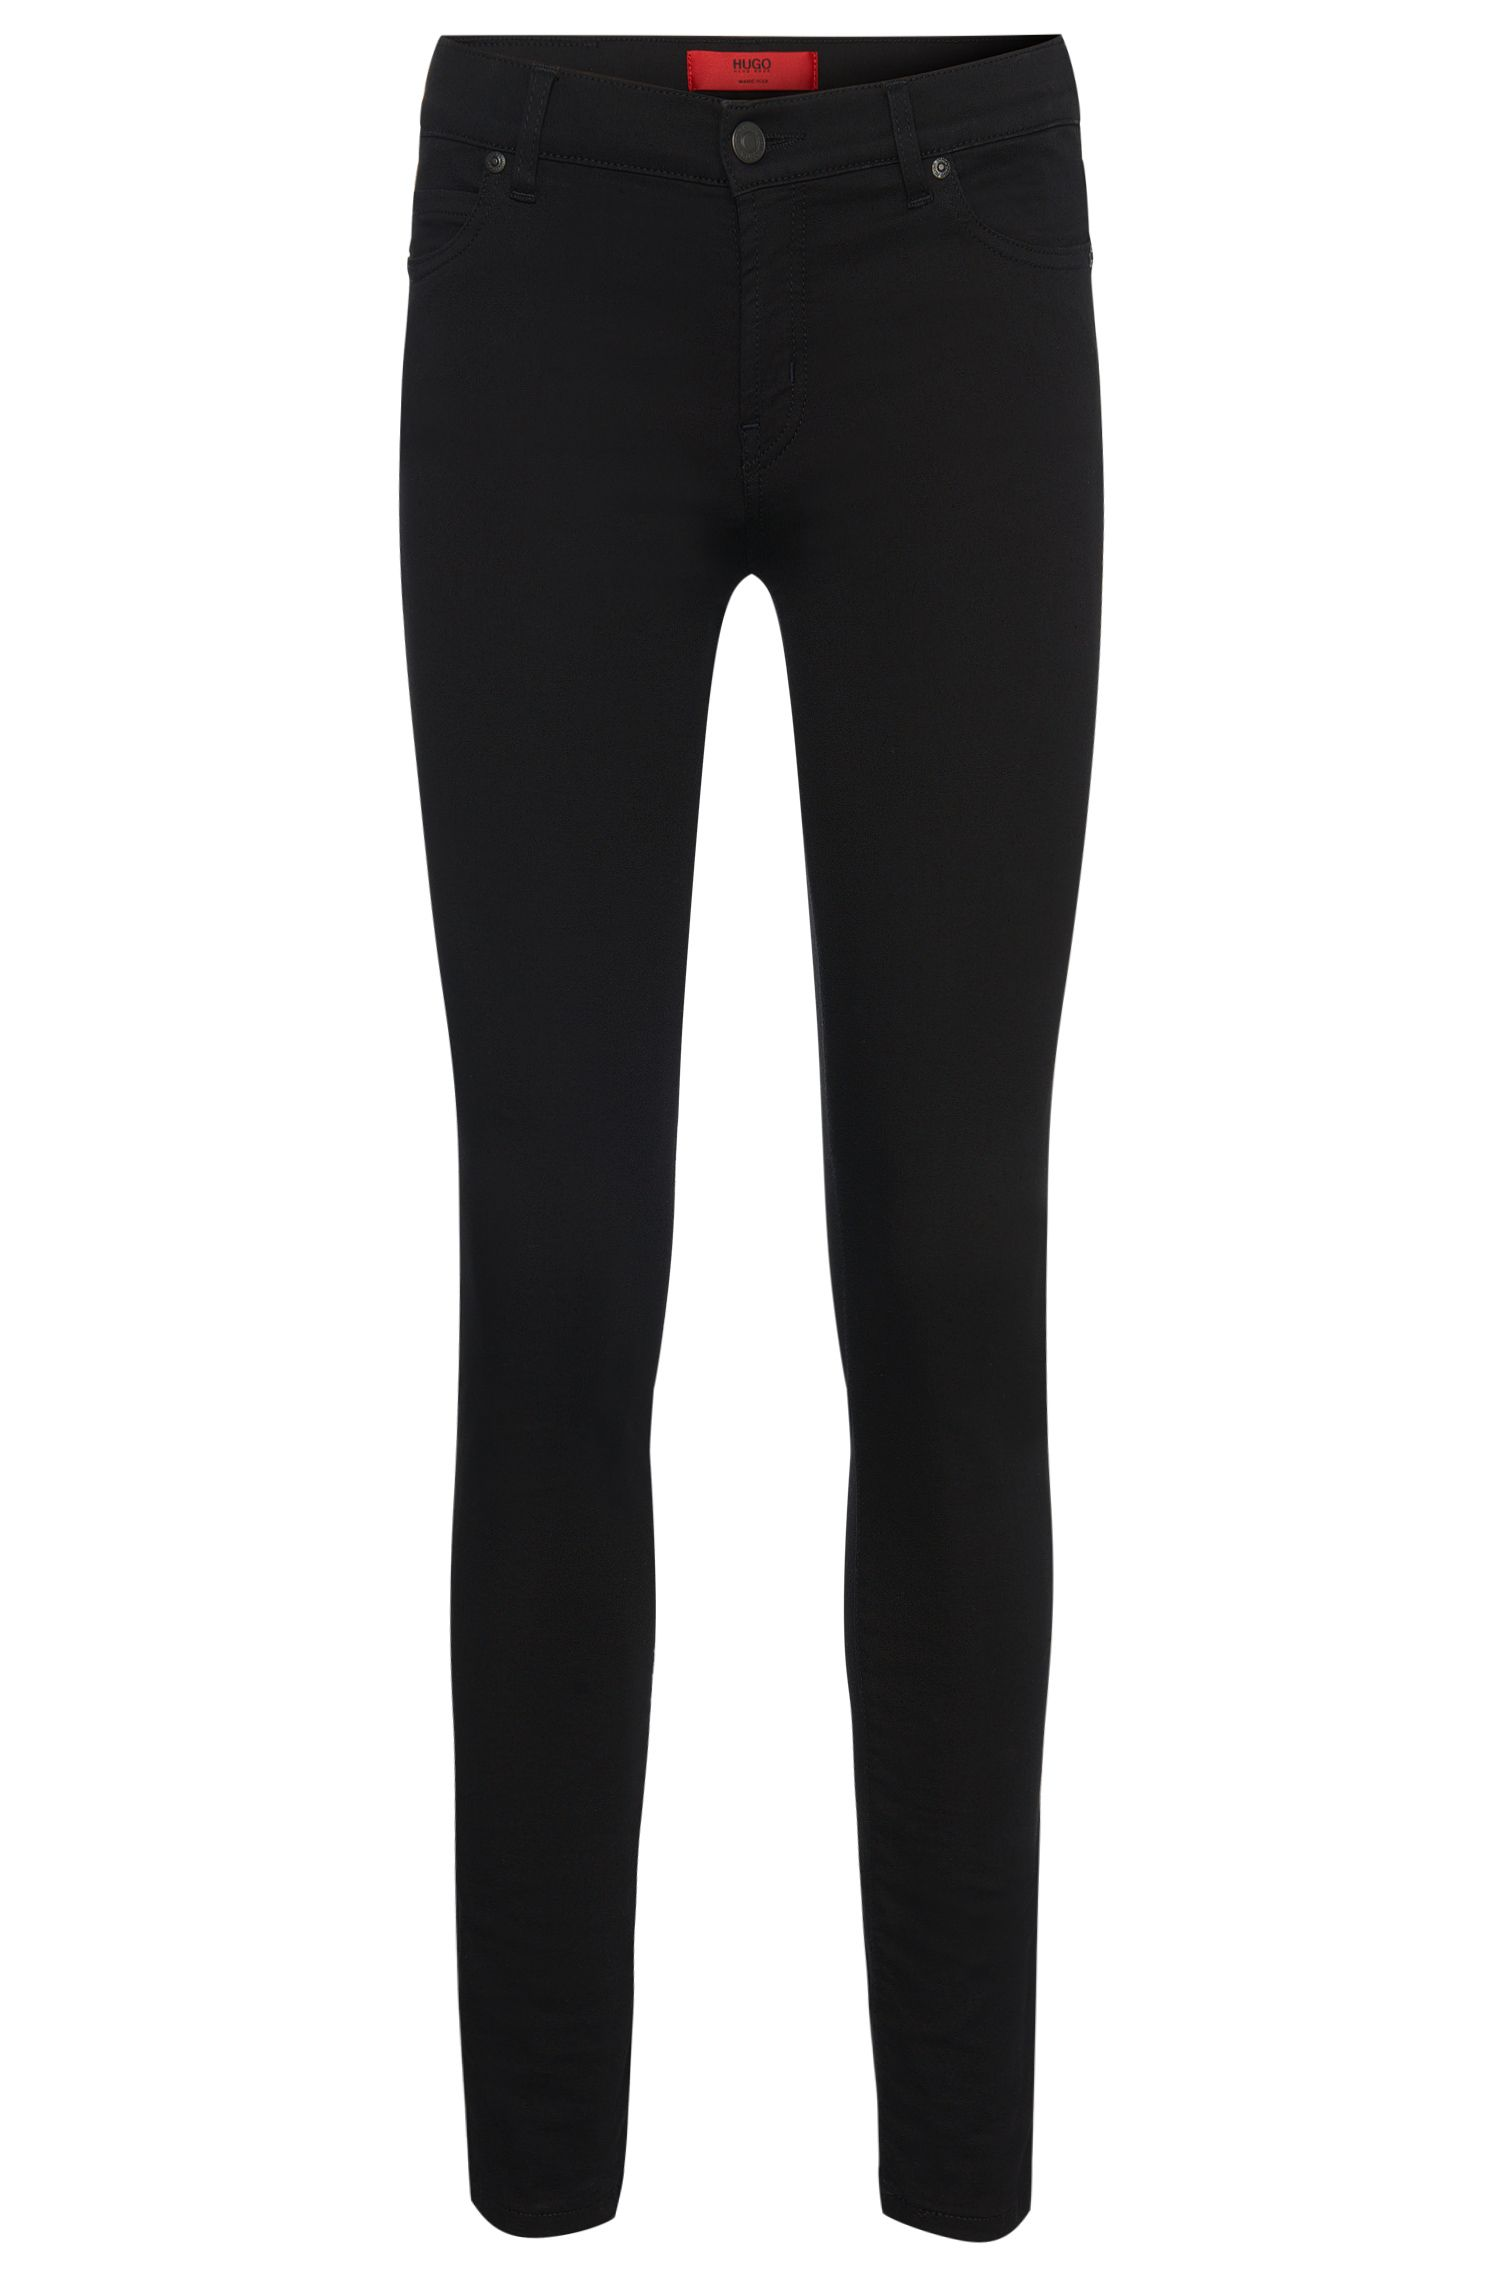 Skinny-Fit Jeans aus elastischem Baumwoll-Mix: 'Georgina'